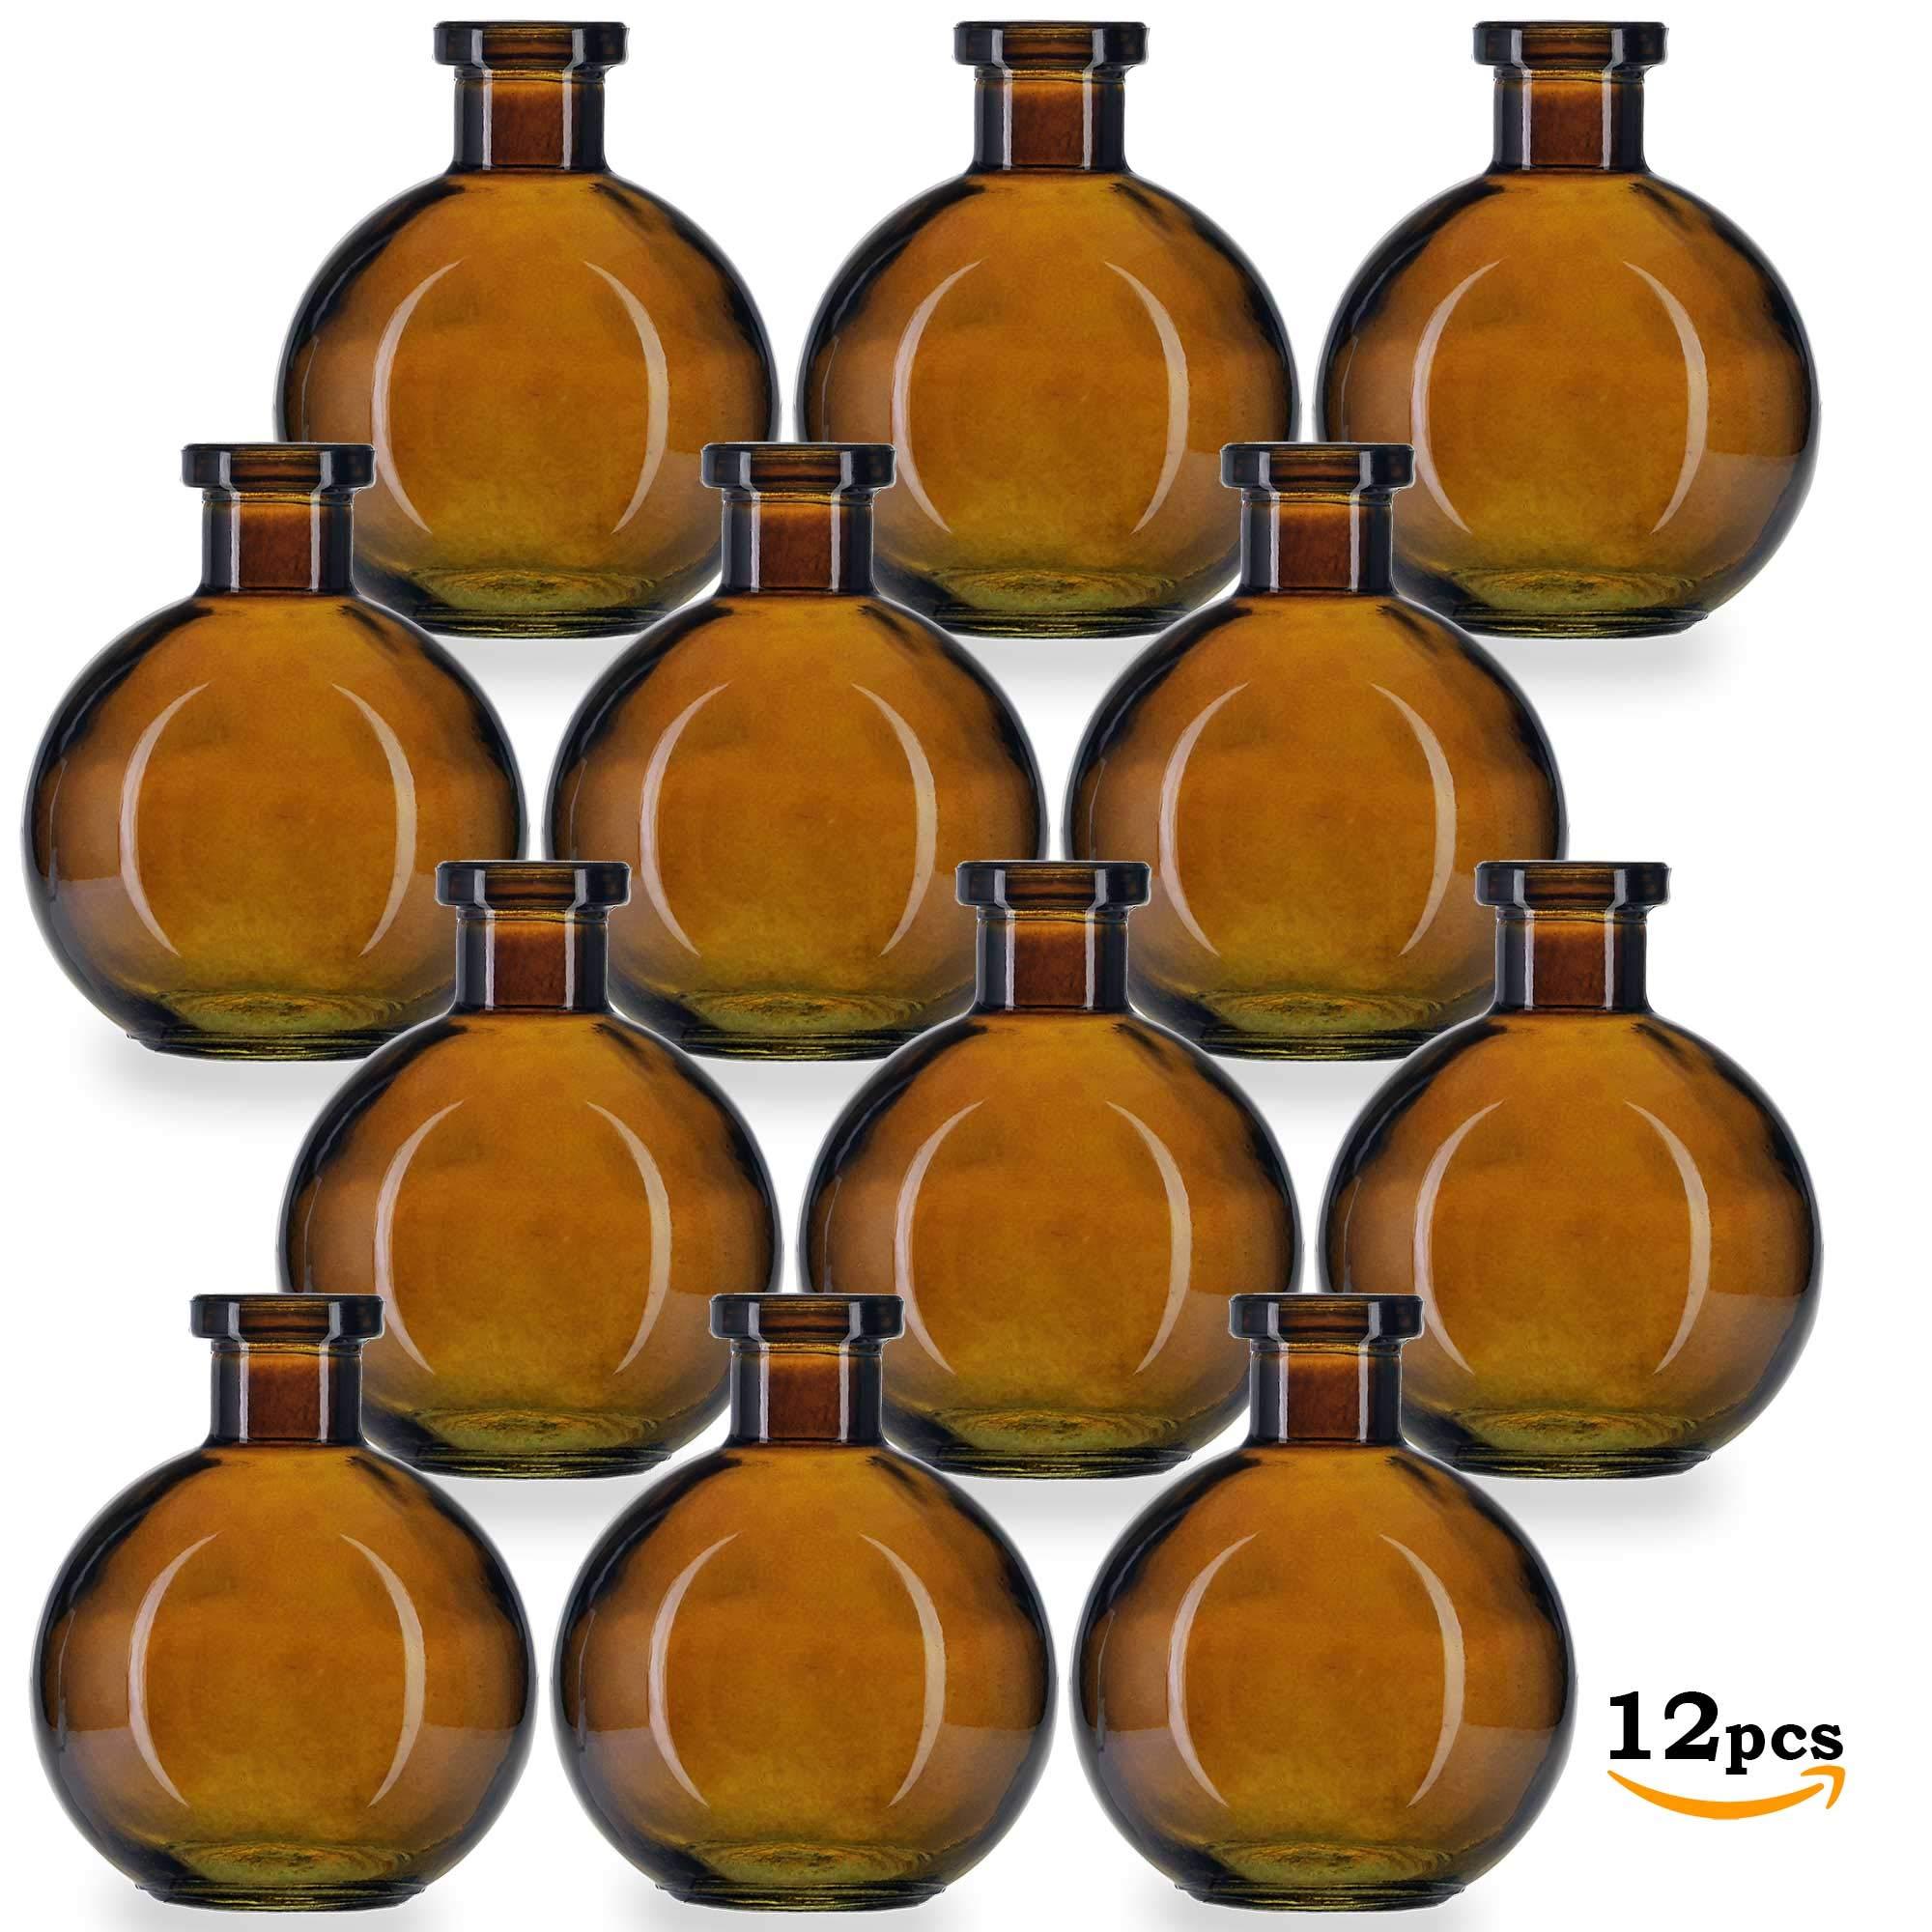 Glassnow C6544G48-N Ball Glass Bottle No Cork, 8.5oz, 12 Pieces, Dark Amber, 250ml, by Glassnow